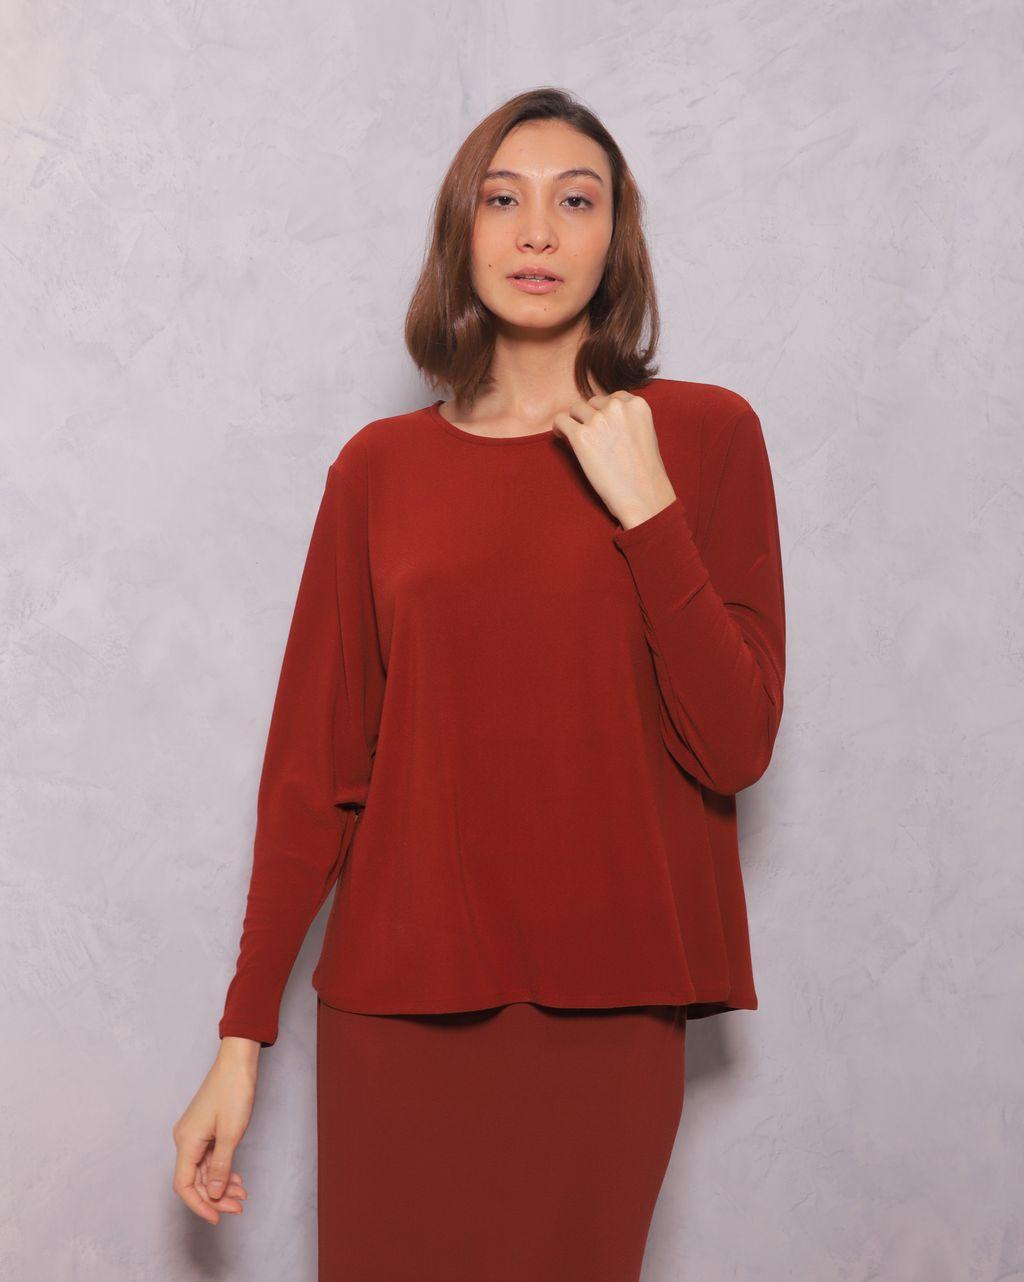 Thinkerbell blouse top portrait front.jpg